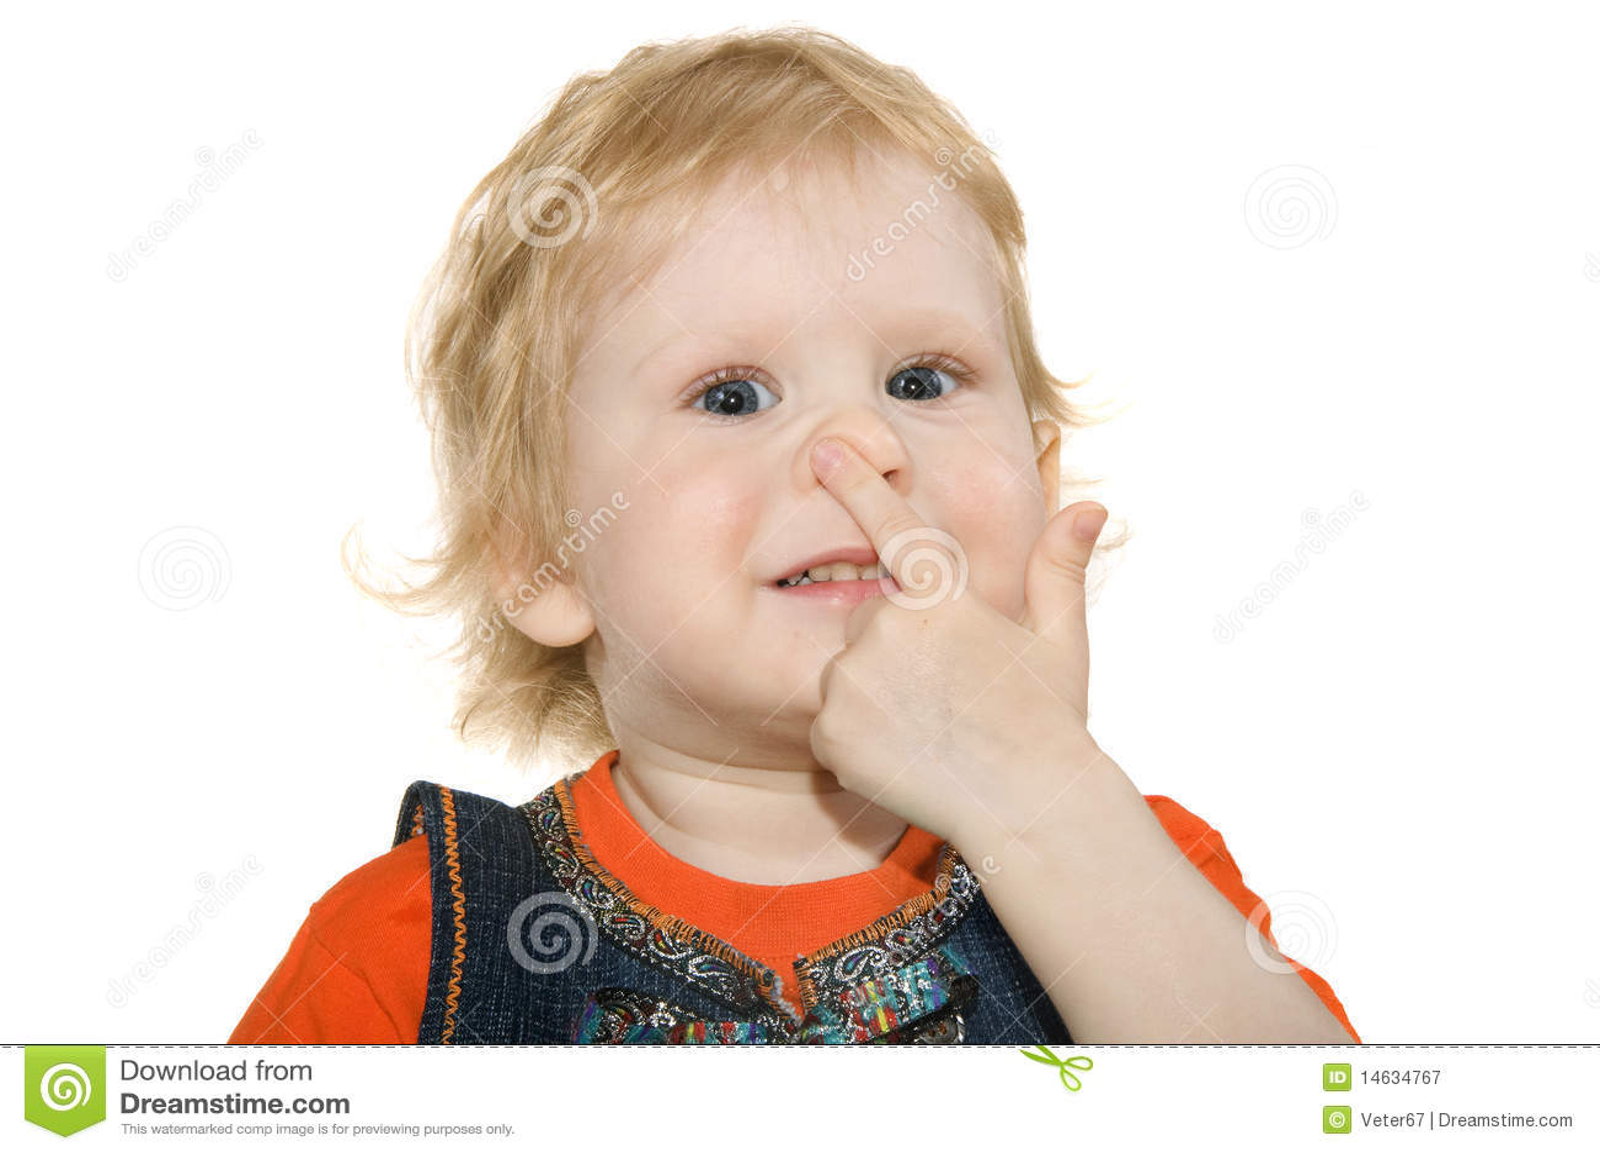 Дети с маленьким носом фото